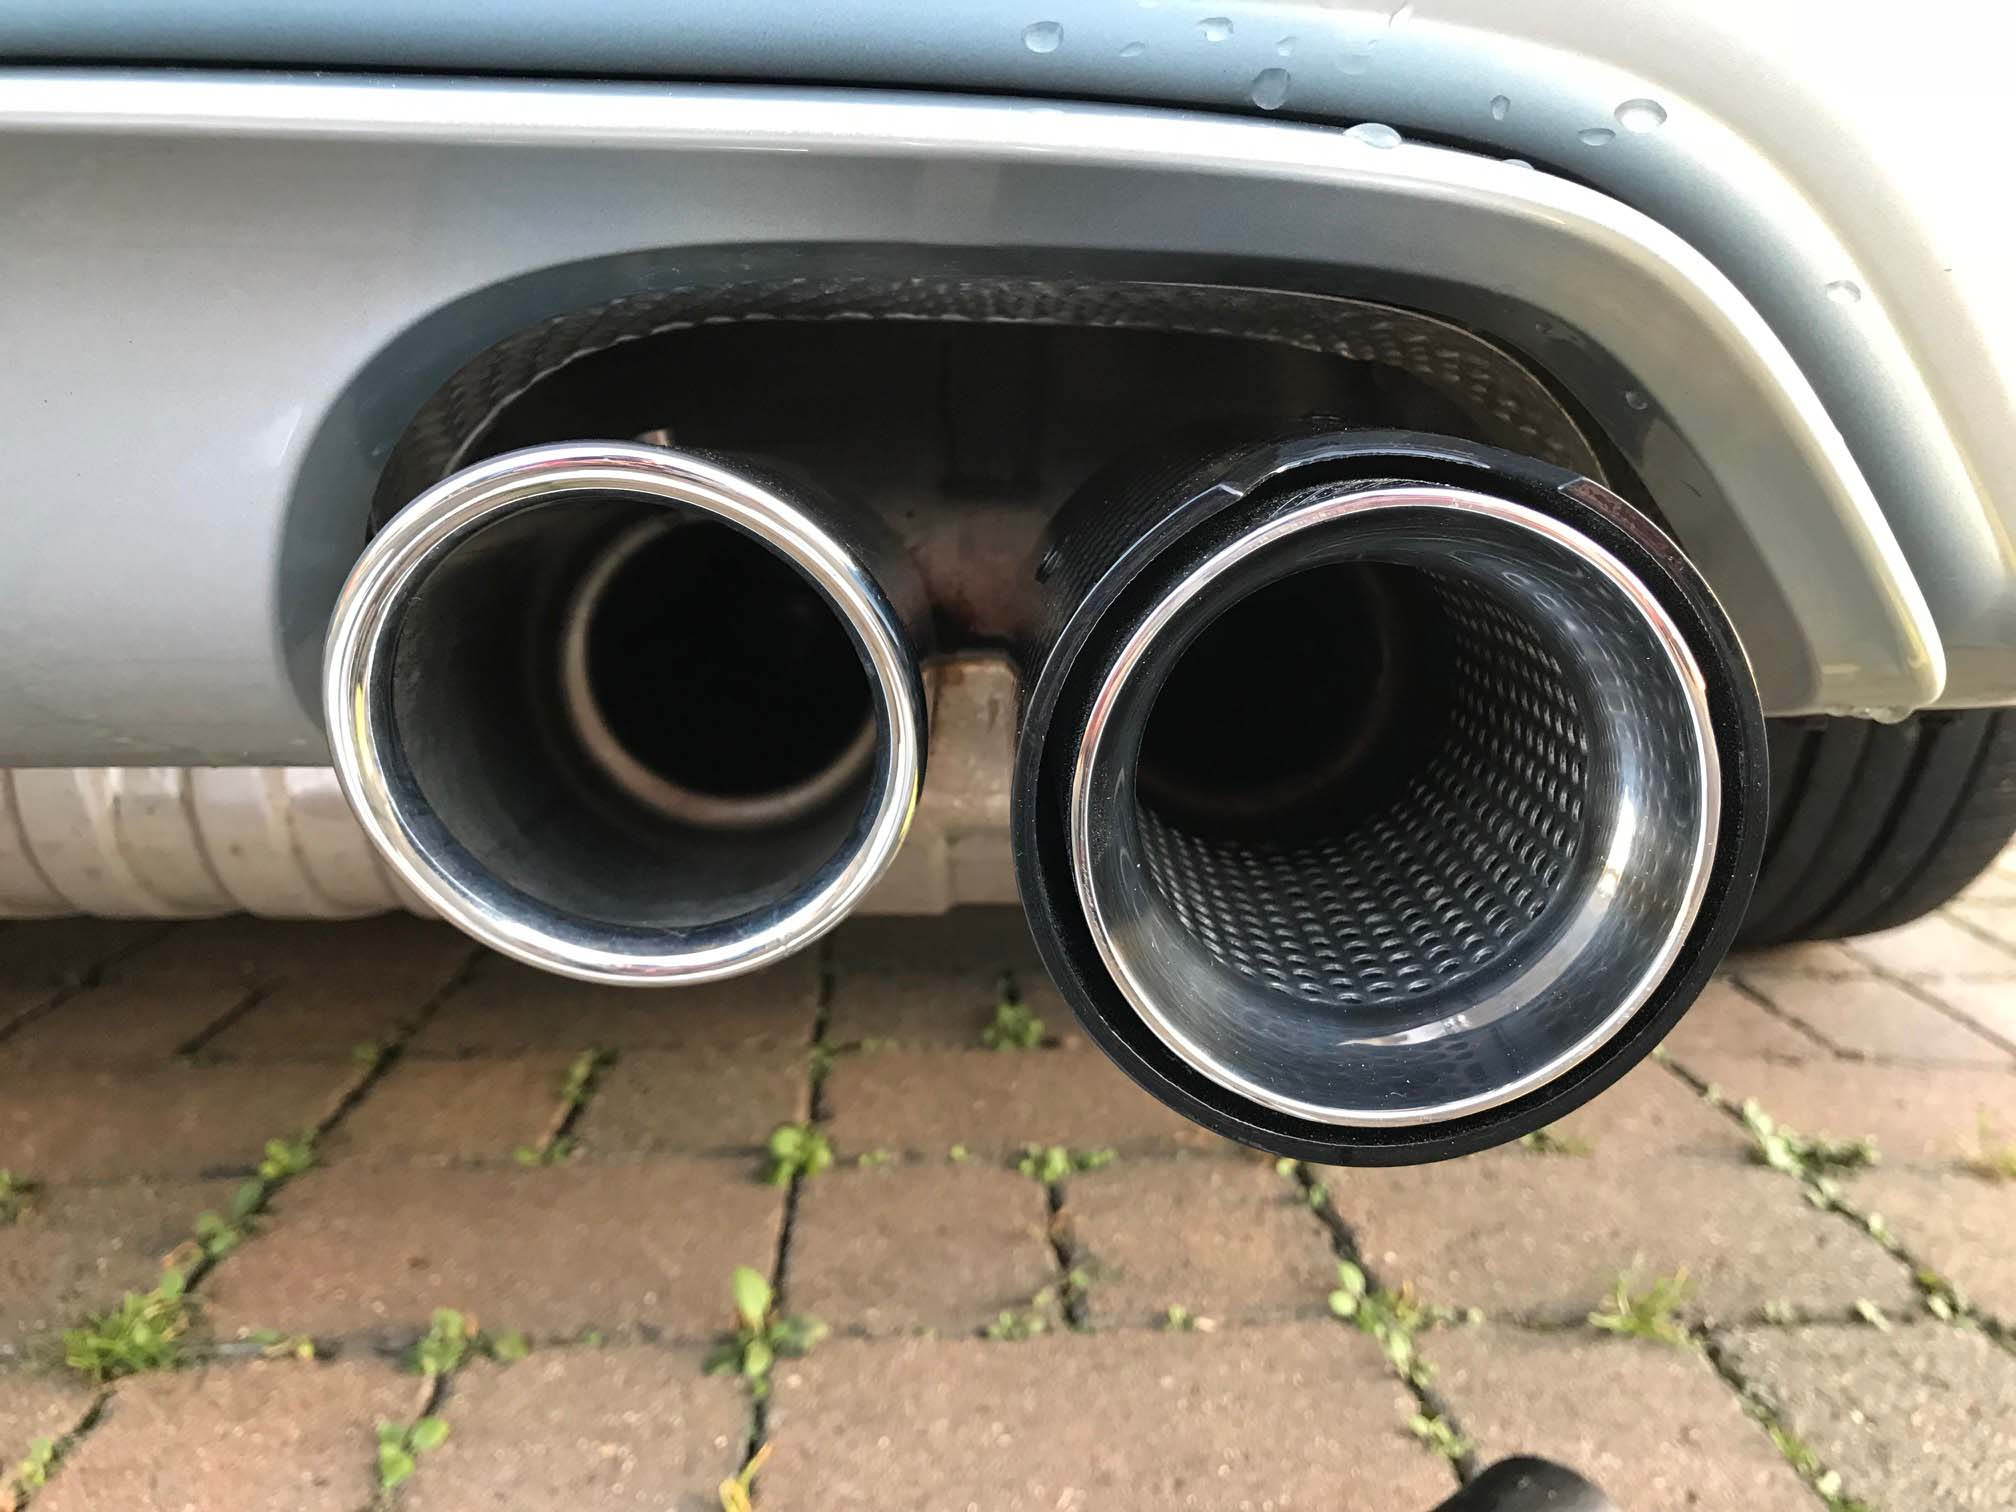 bmw m2 m3 m4 m5 m6 carbon fibre perforated exhaust tips